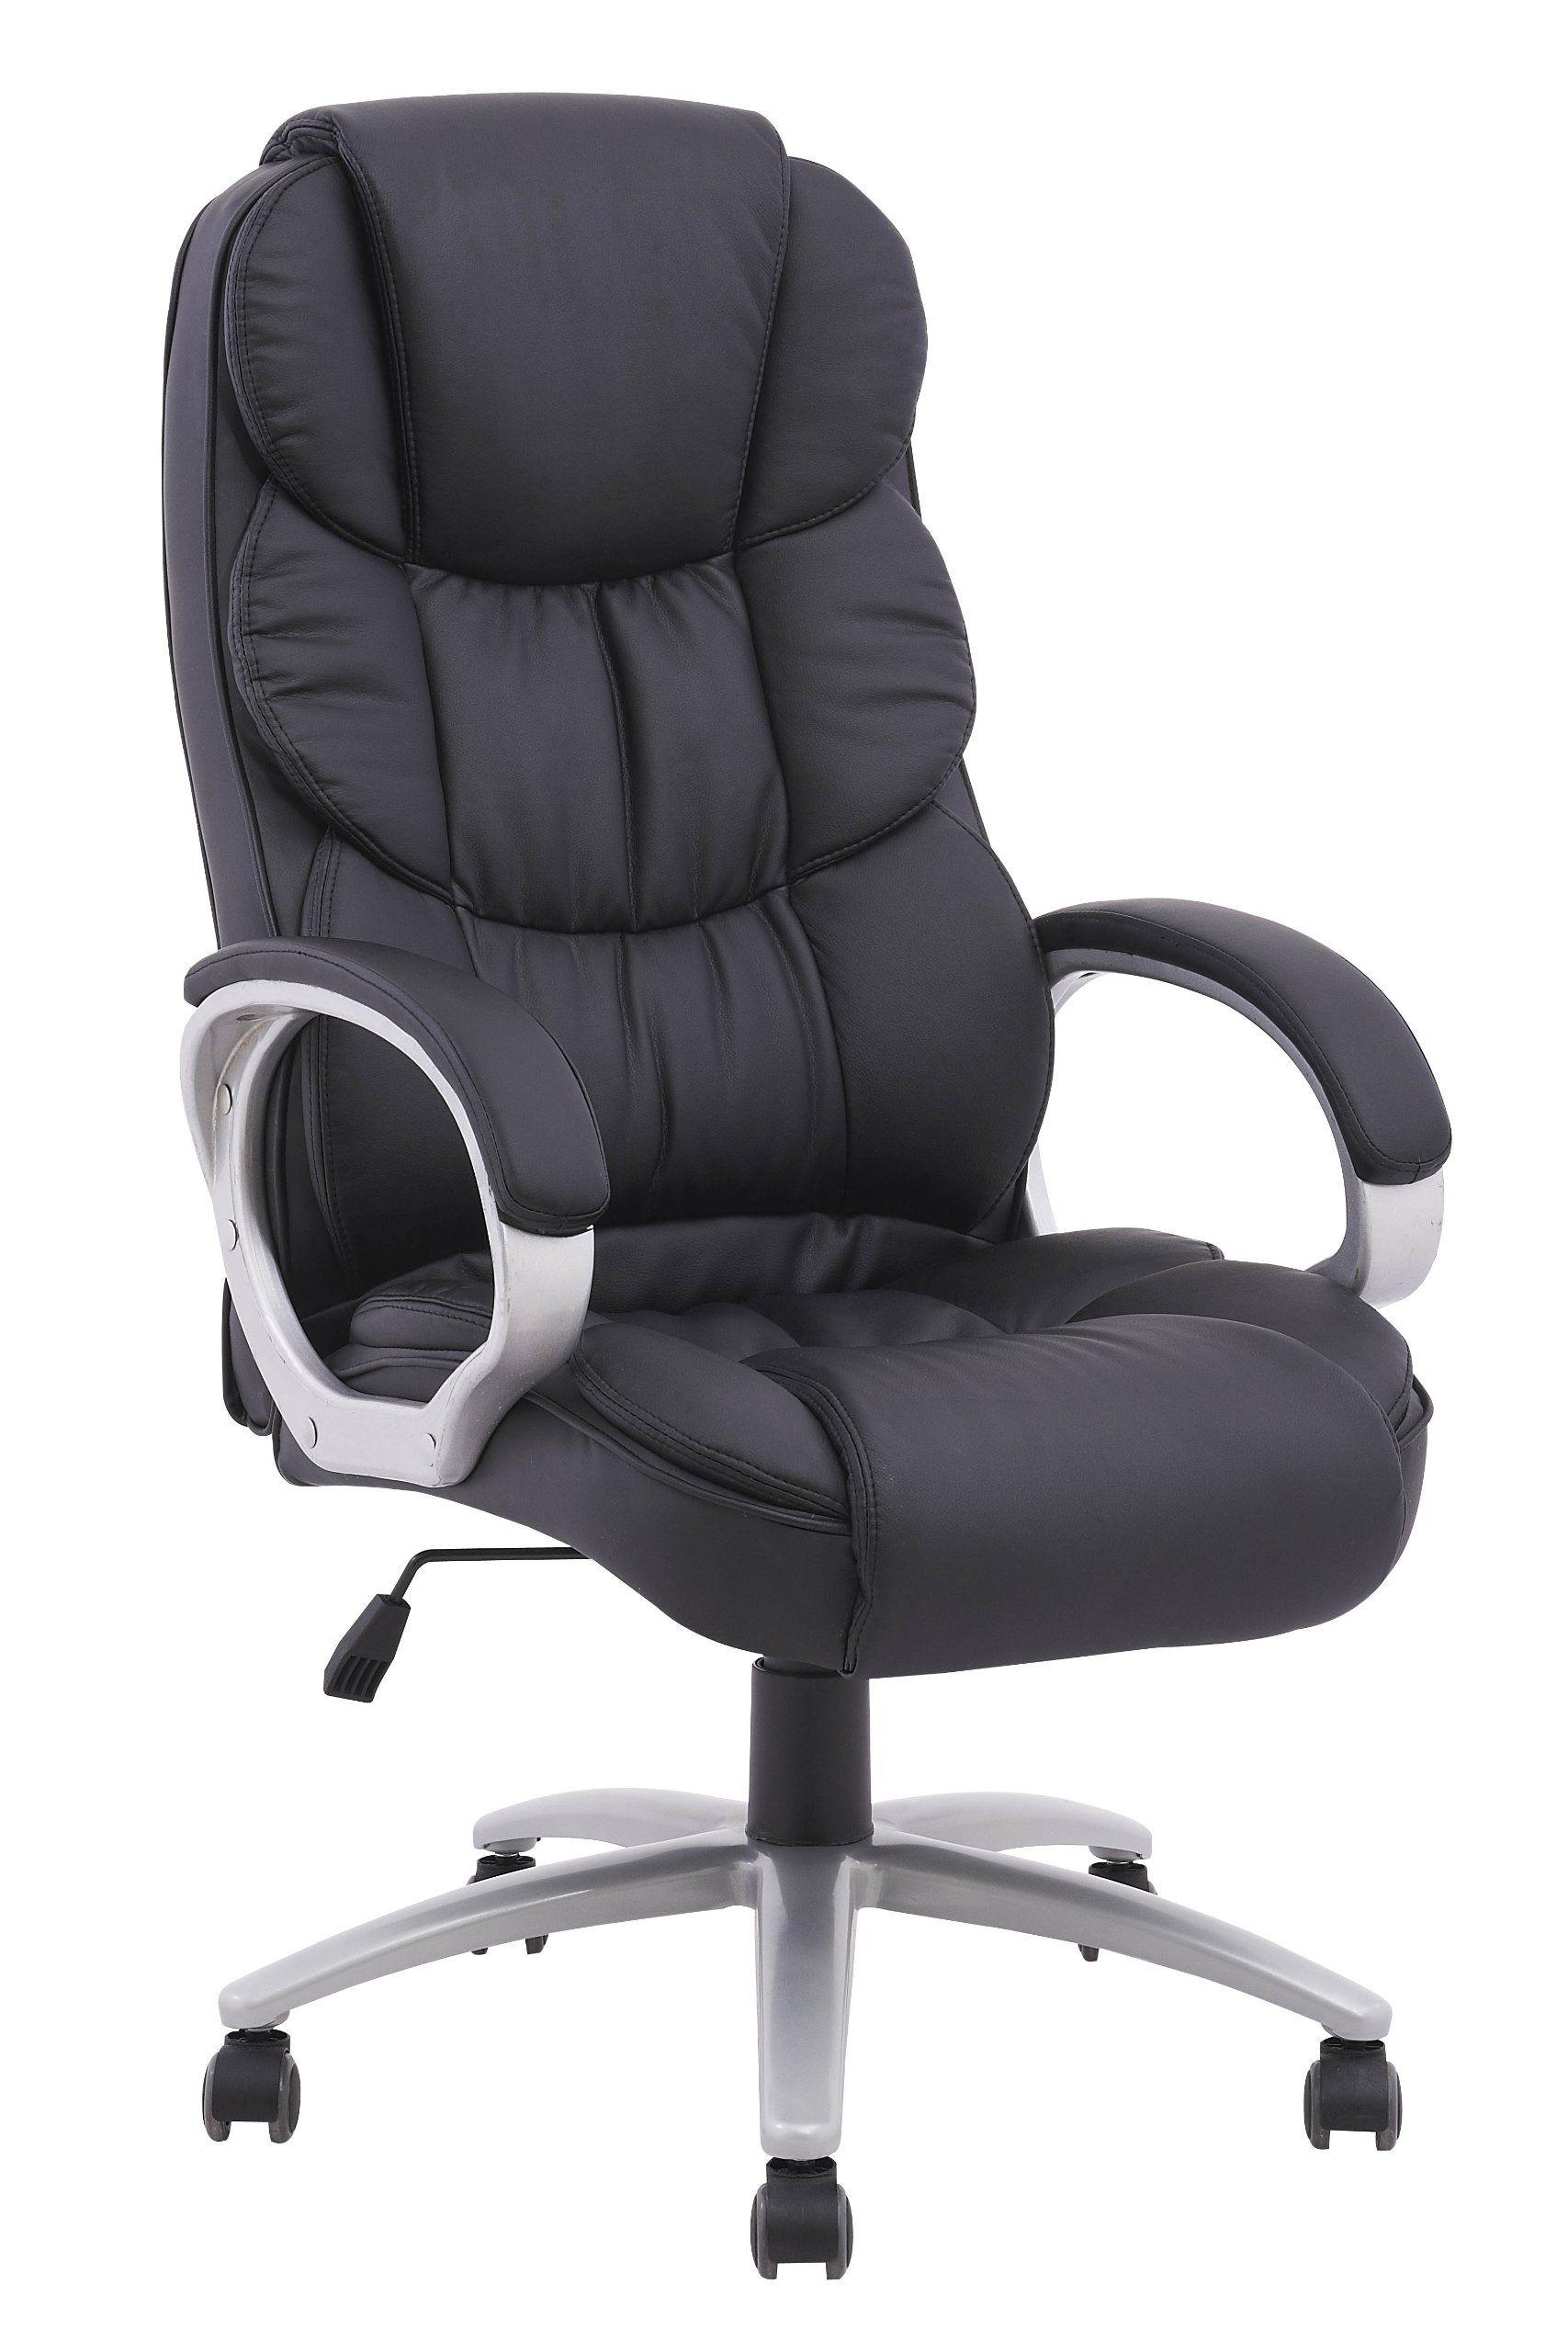 high back executive pu leather ergonomic office desk computer chair